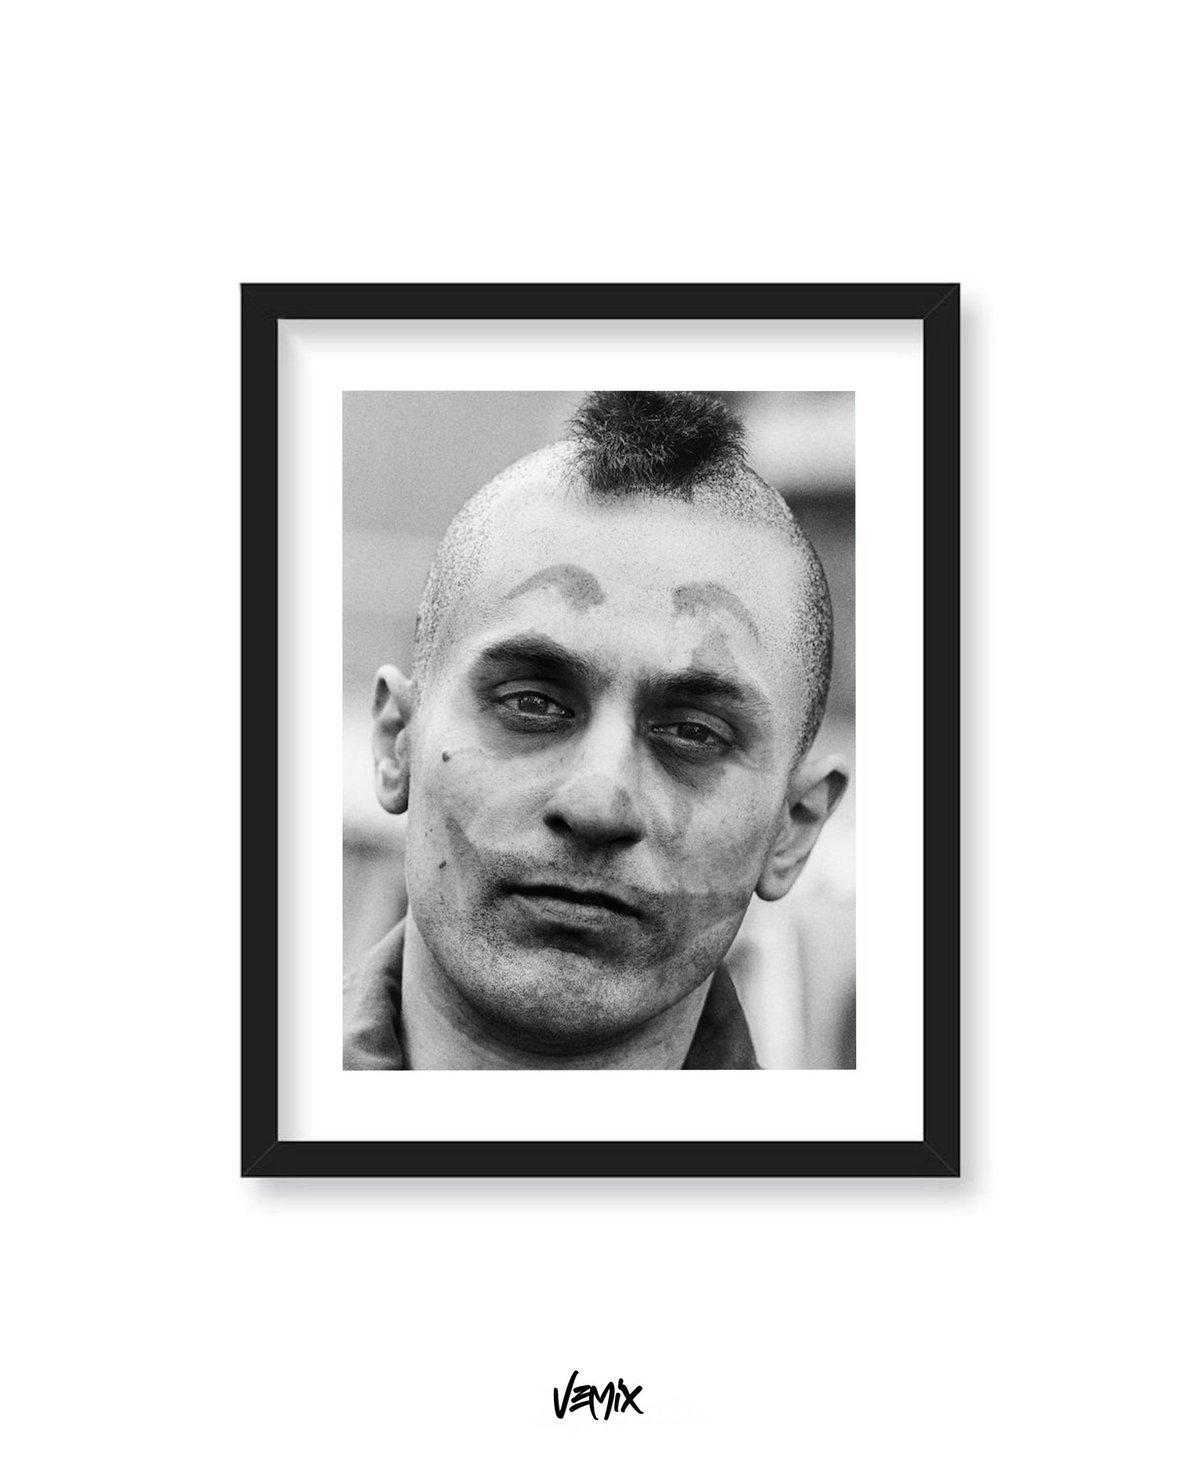 Image of You Laughing at Me? - Print/Tee/Hoodie